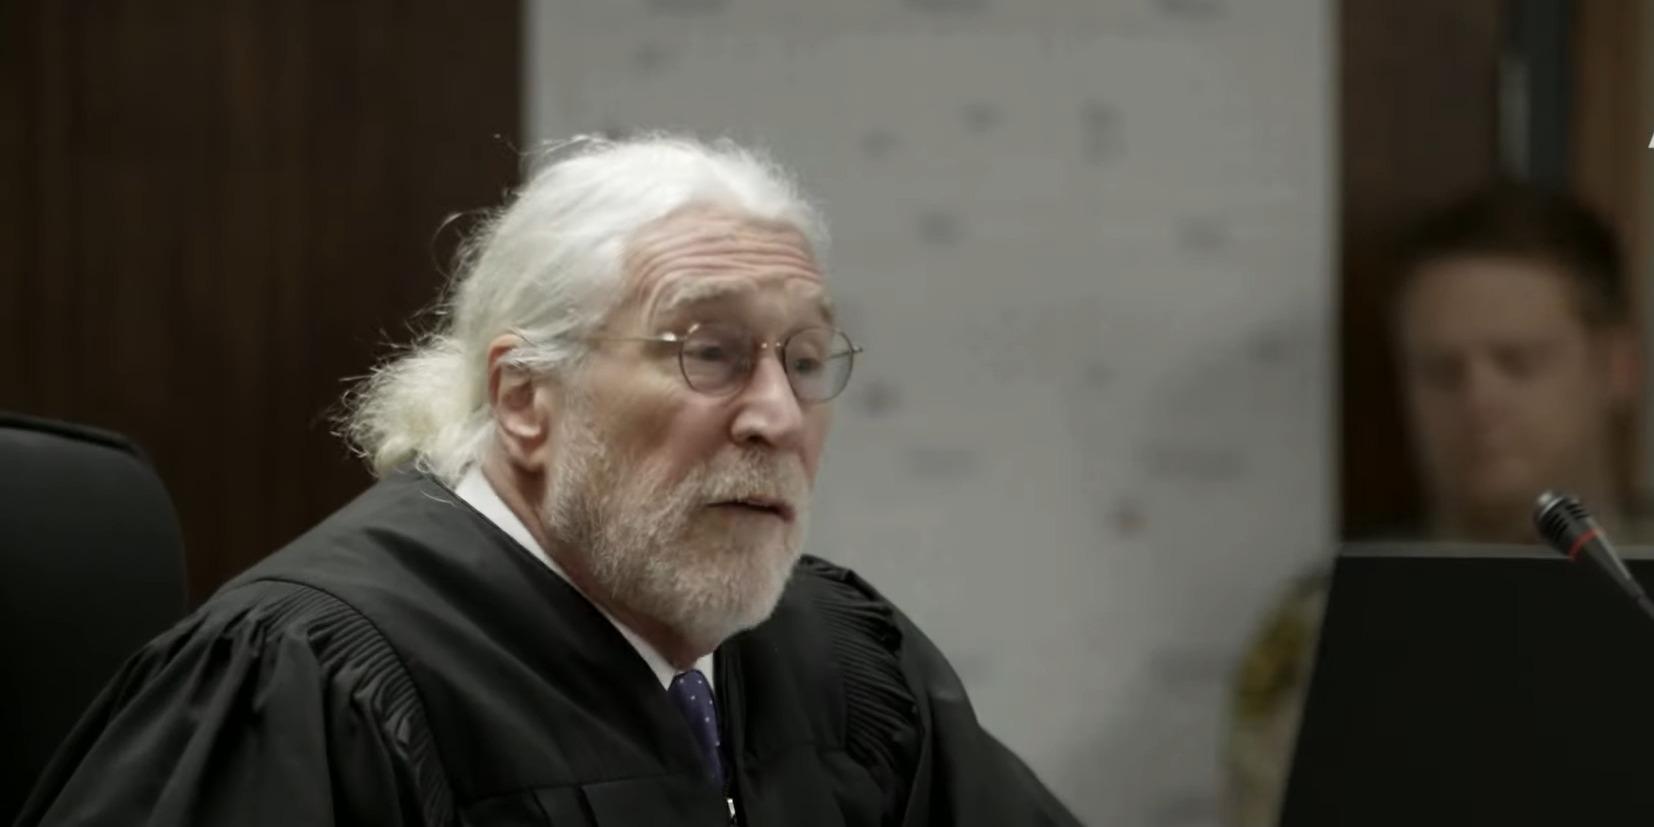 Accused: Guilty or Innocent Season 2